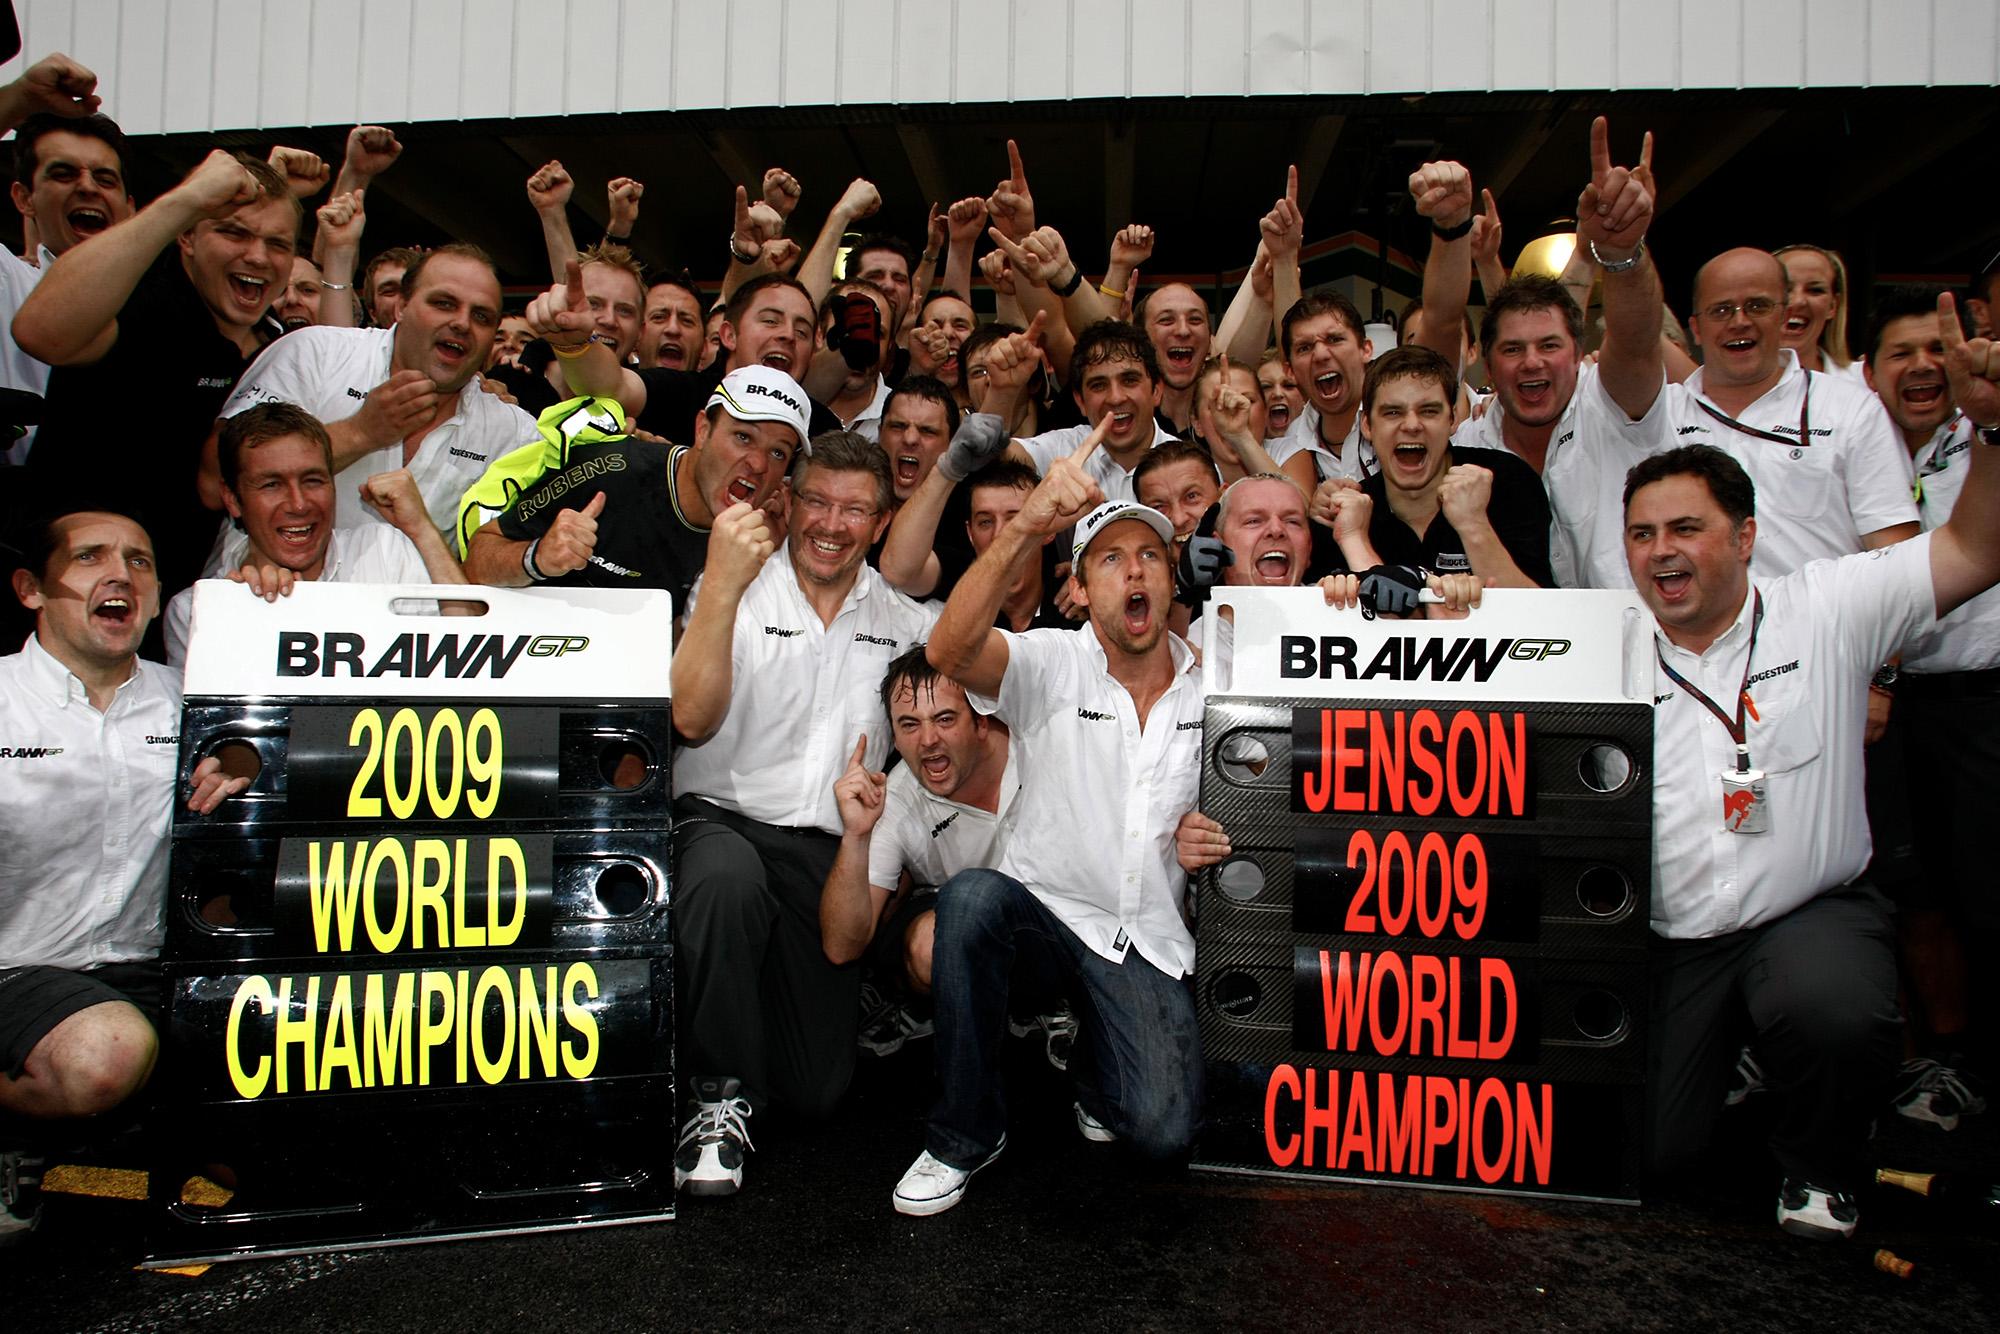 Brawn GP celebrates winning both 2009 F1 championshiops